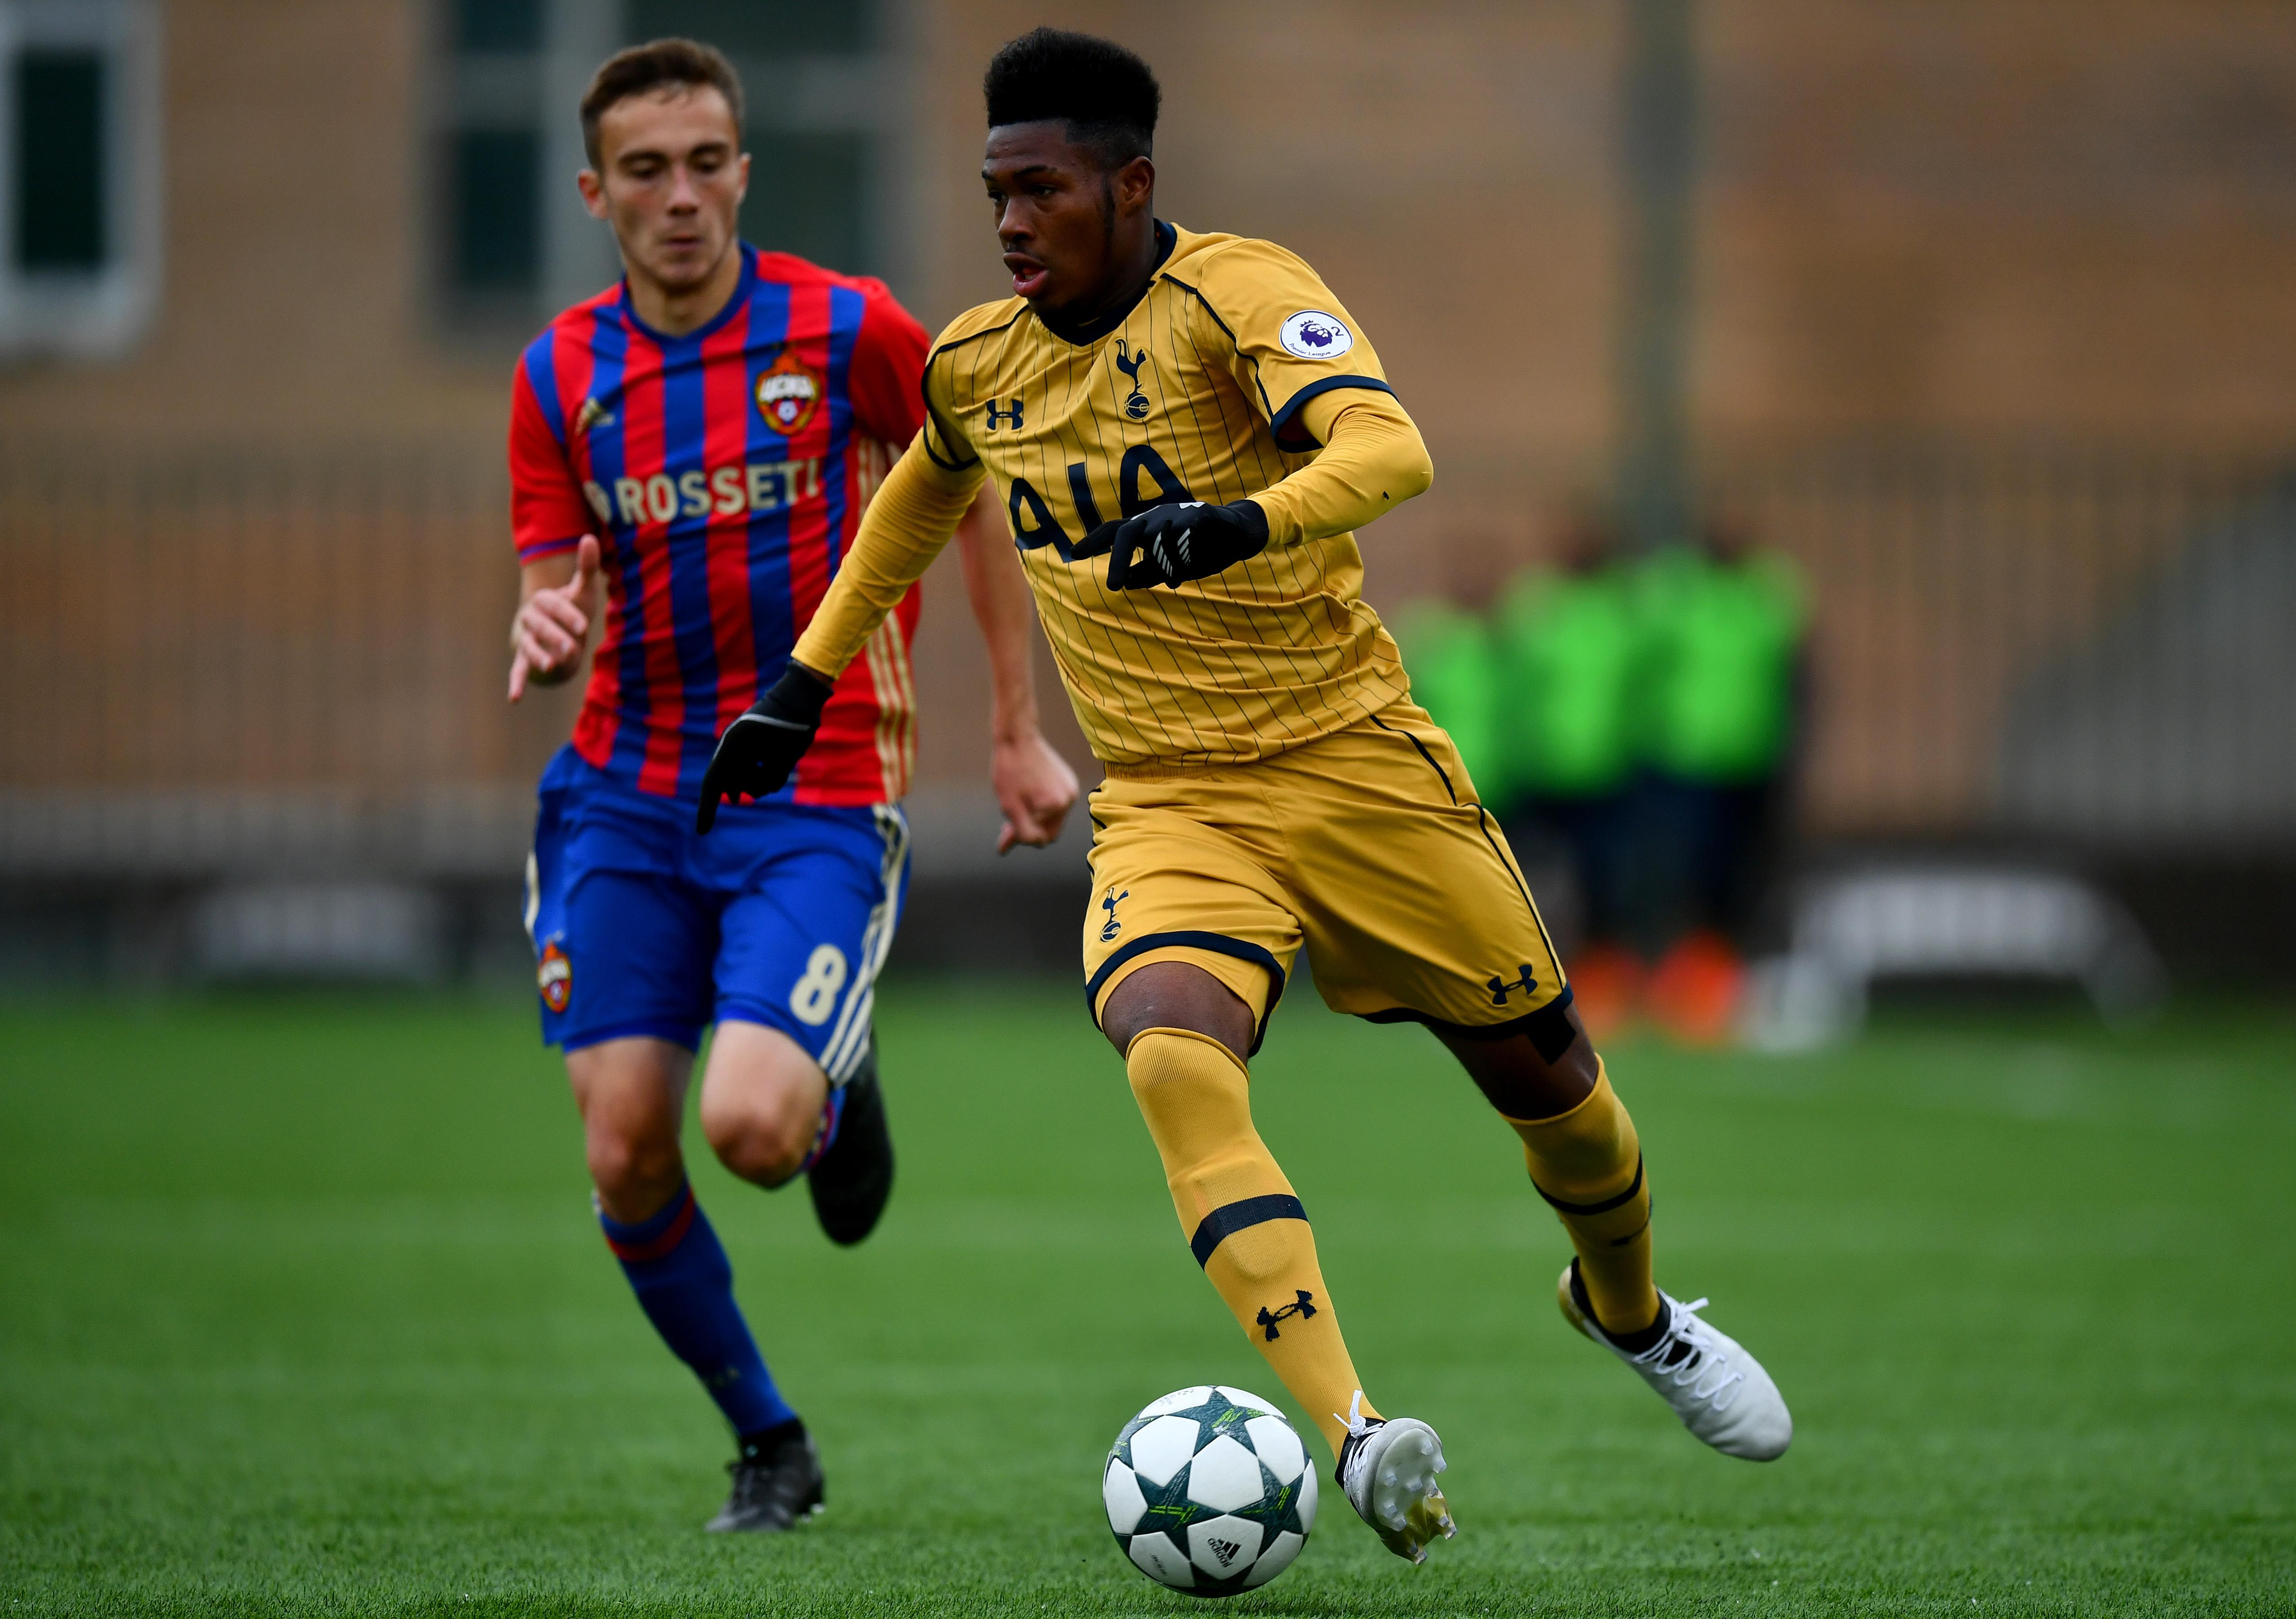 Lyon chipe la pépite anglaise Reo Griffiths à Tottenham — Mercato